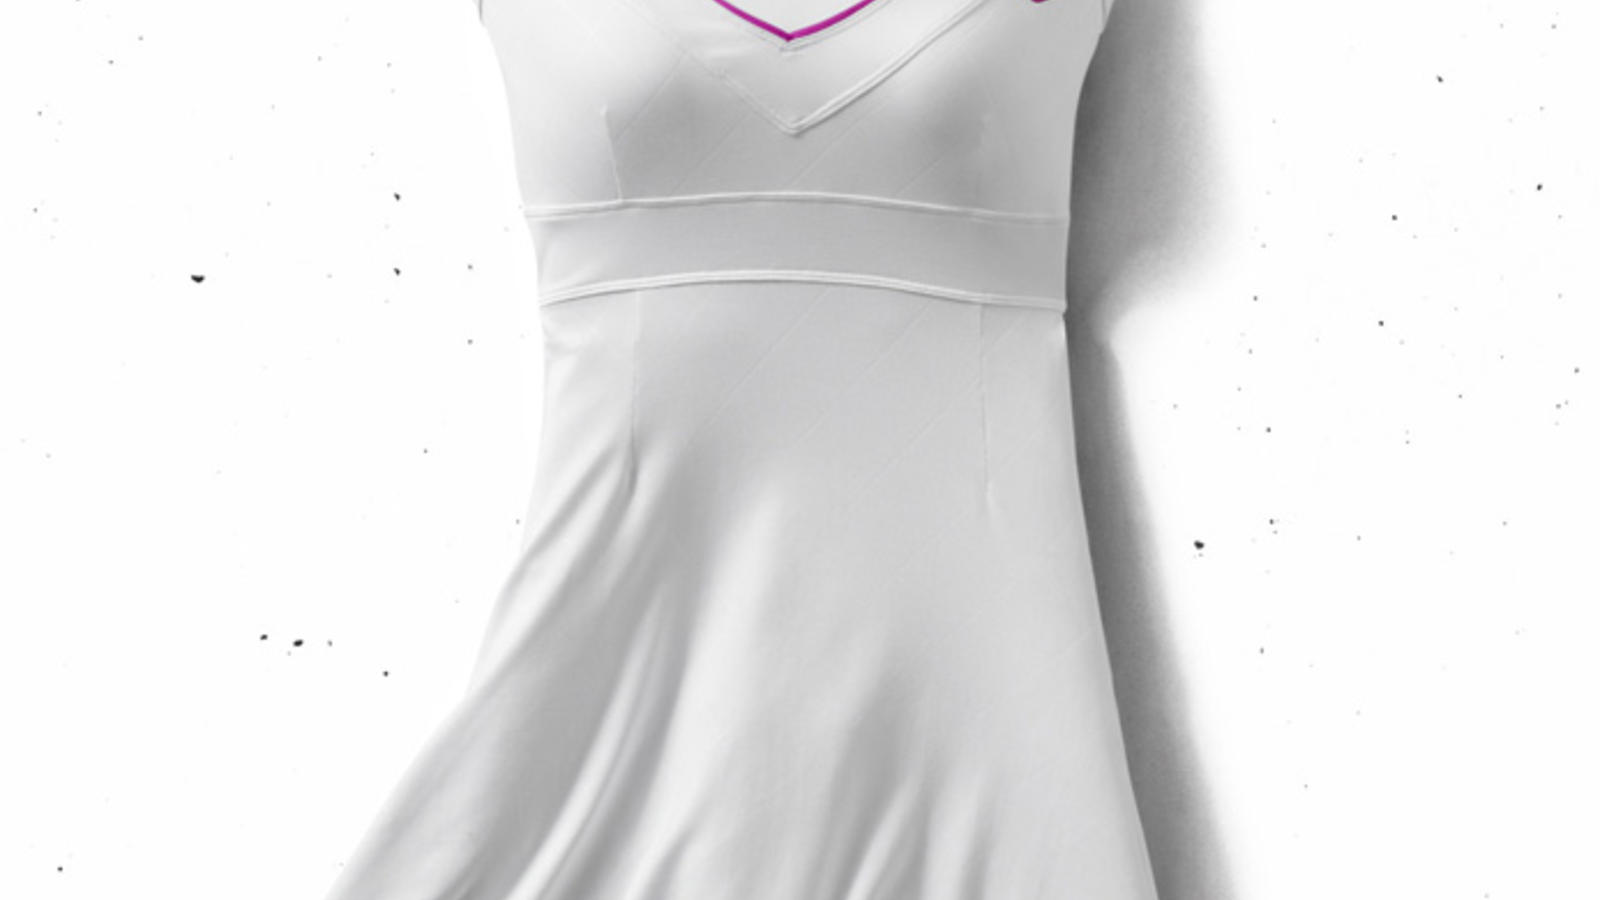 Serena Williams Wimbledon 2012